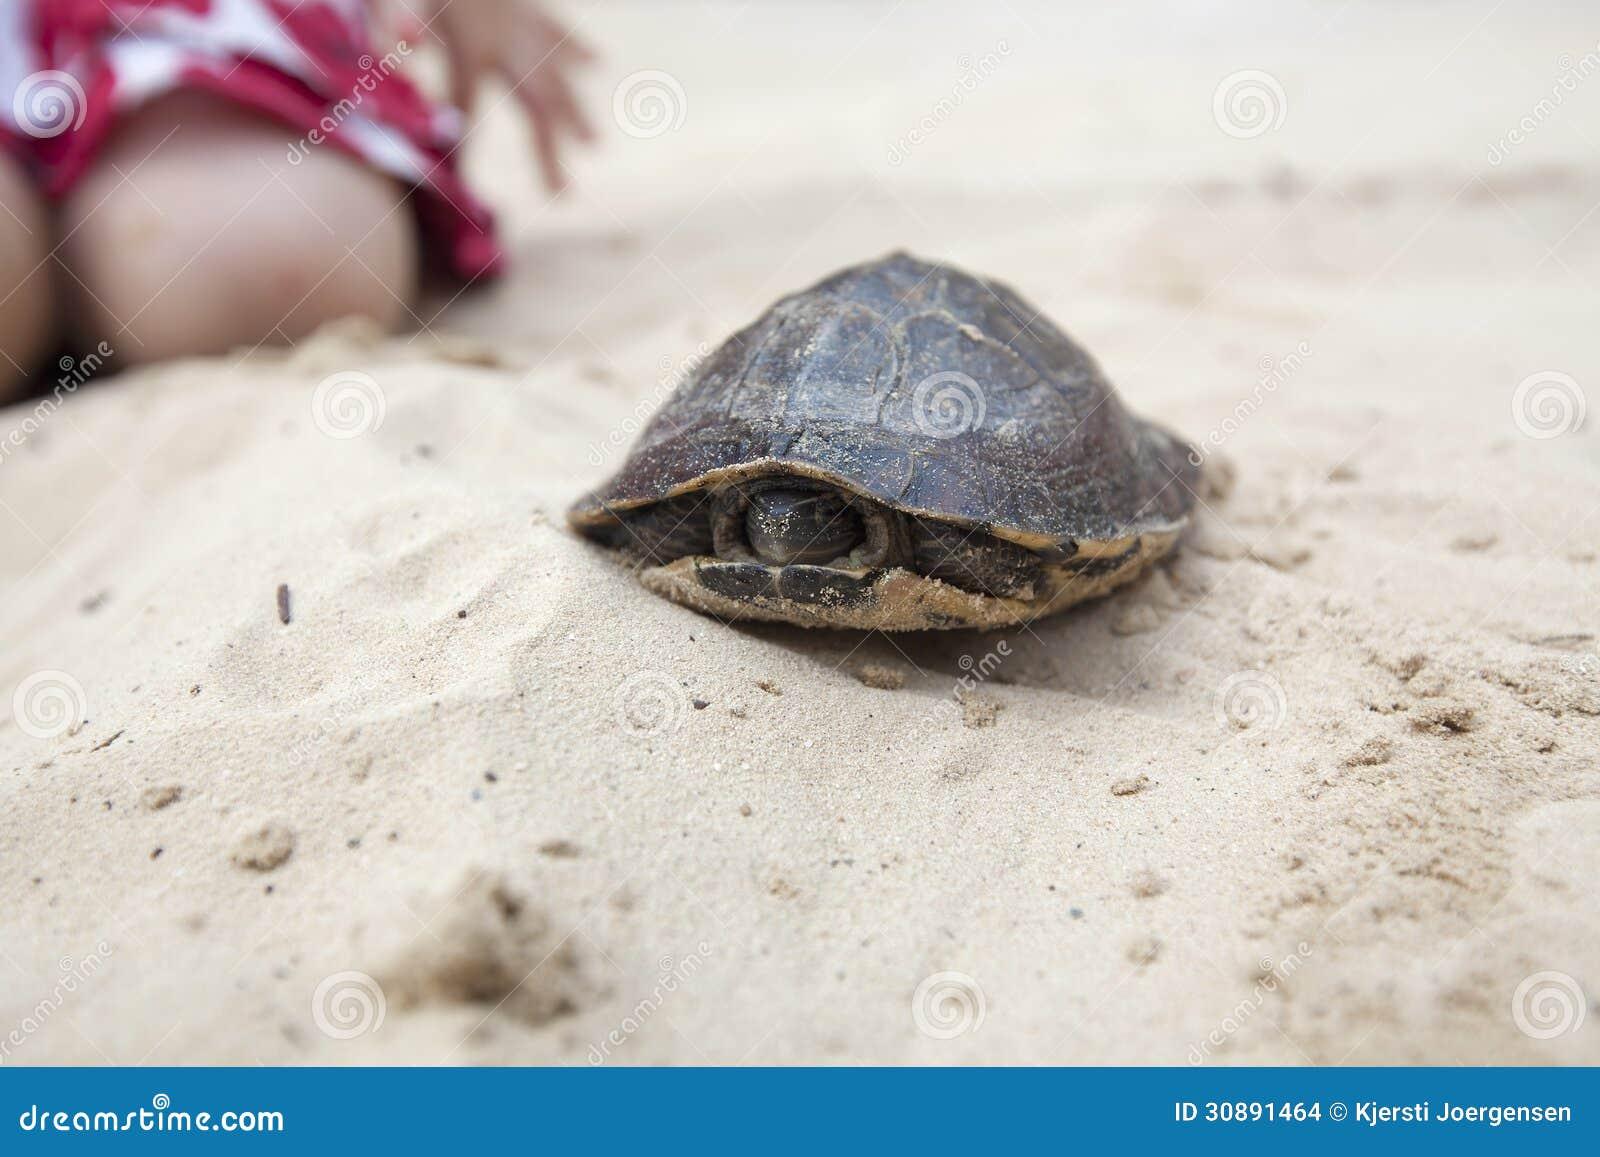 sand turtle pet pets world